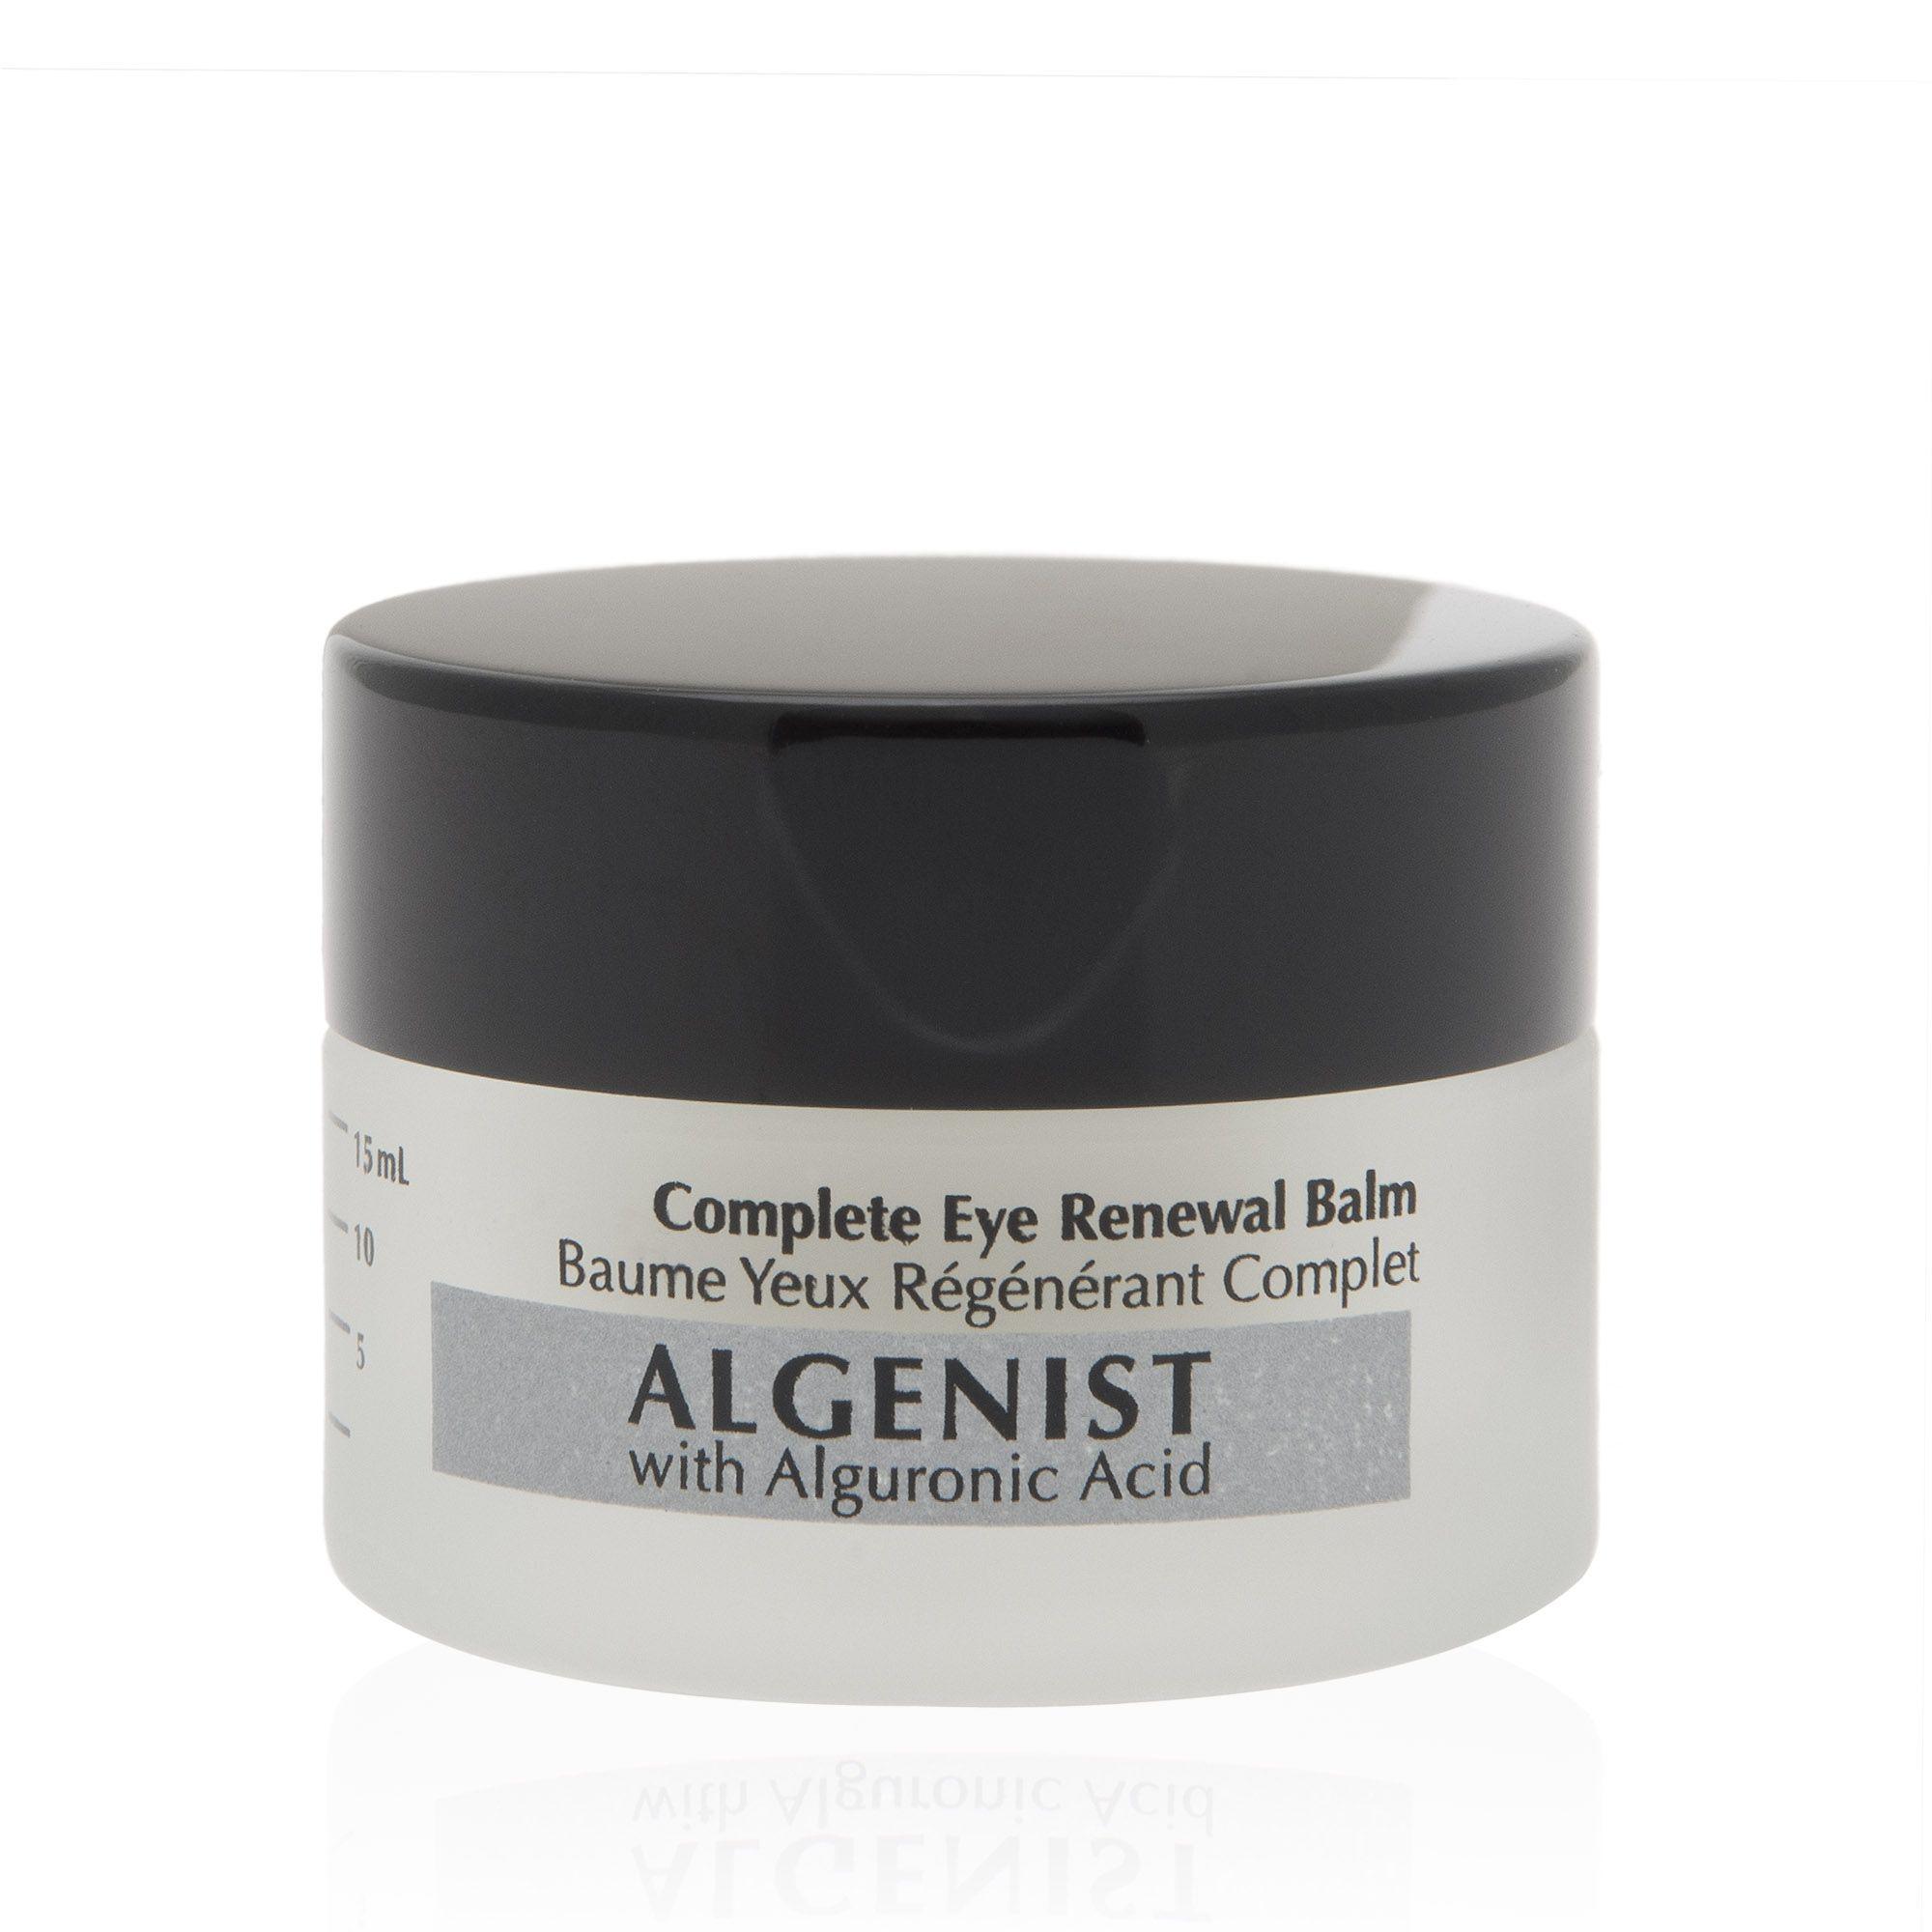 algenist complete eye renewal balm kit